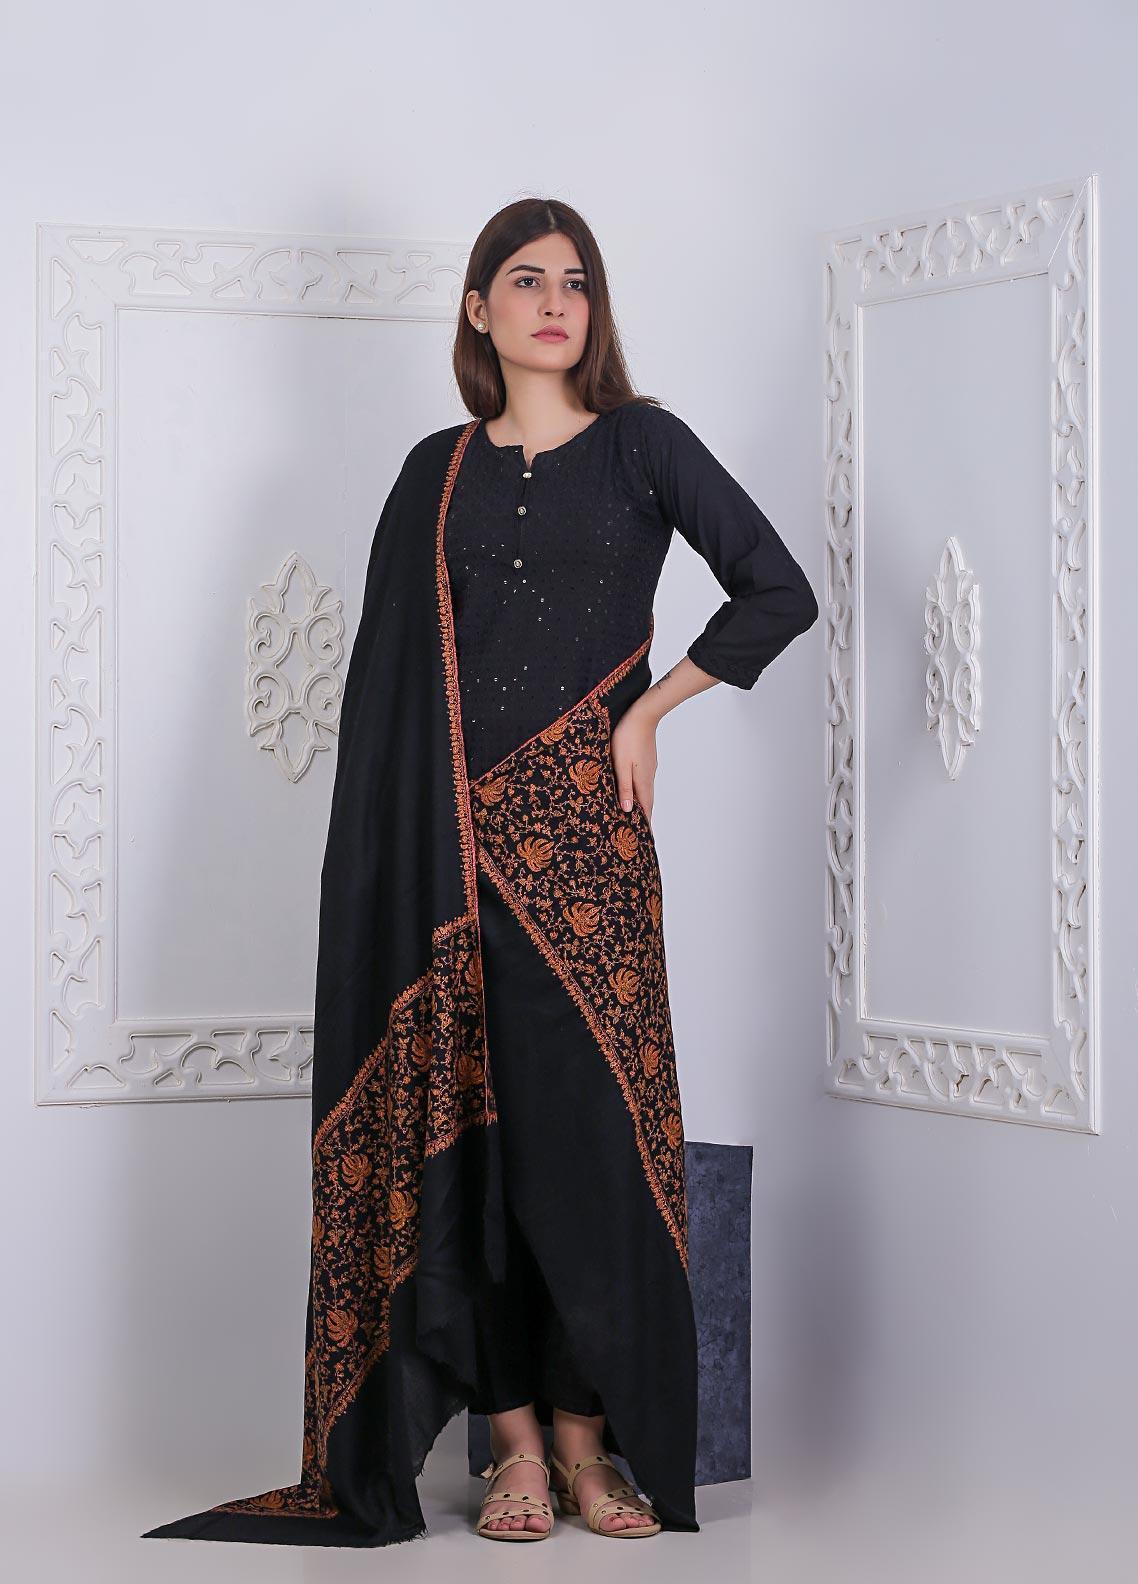 Sanaulla Exclusive Range Embroidered Pashmina  Shawl AKP-05 Black - Pashmina Shawls